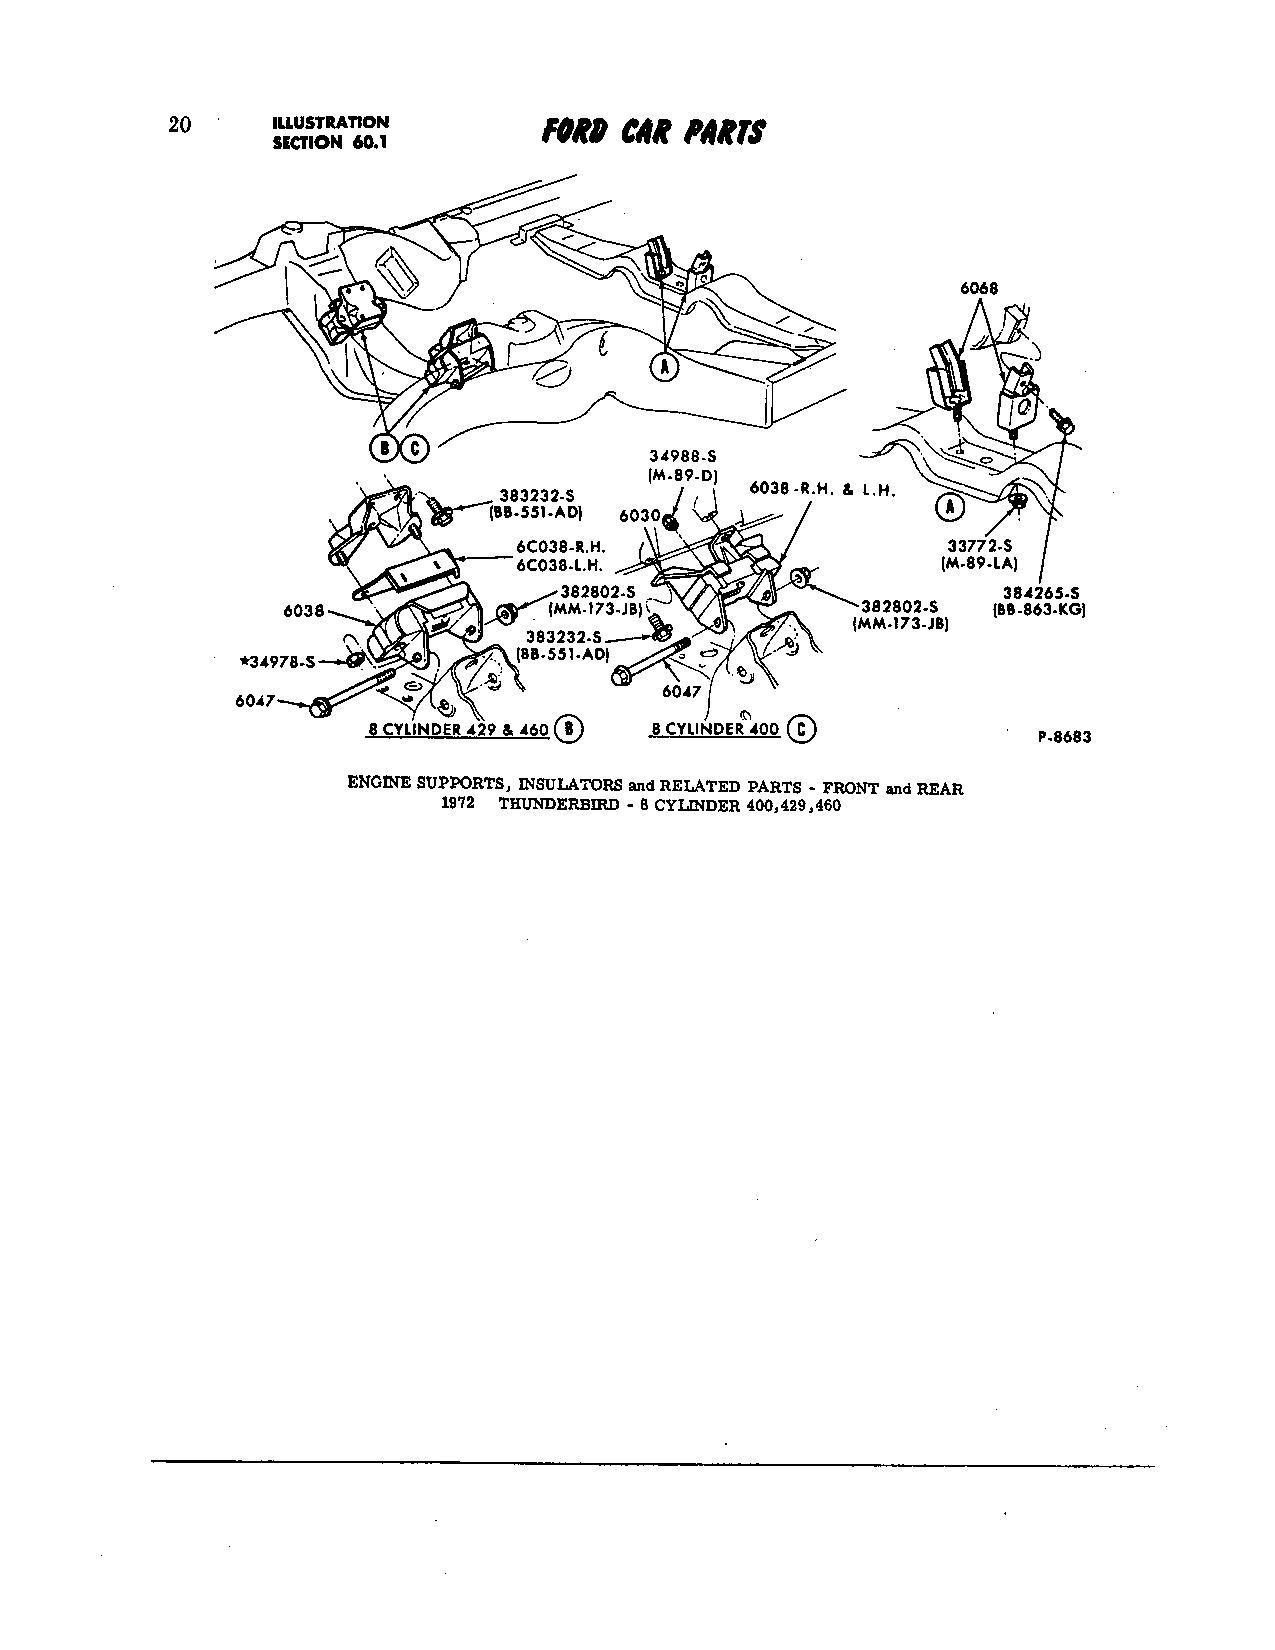 F100 Help On Parts Identification